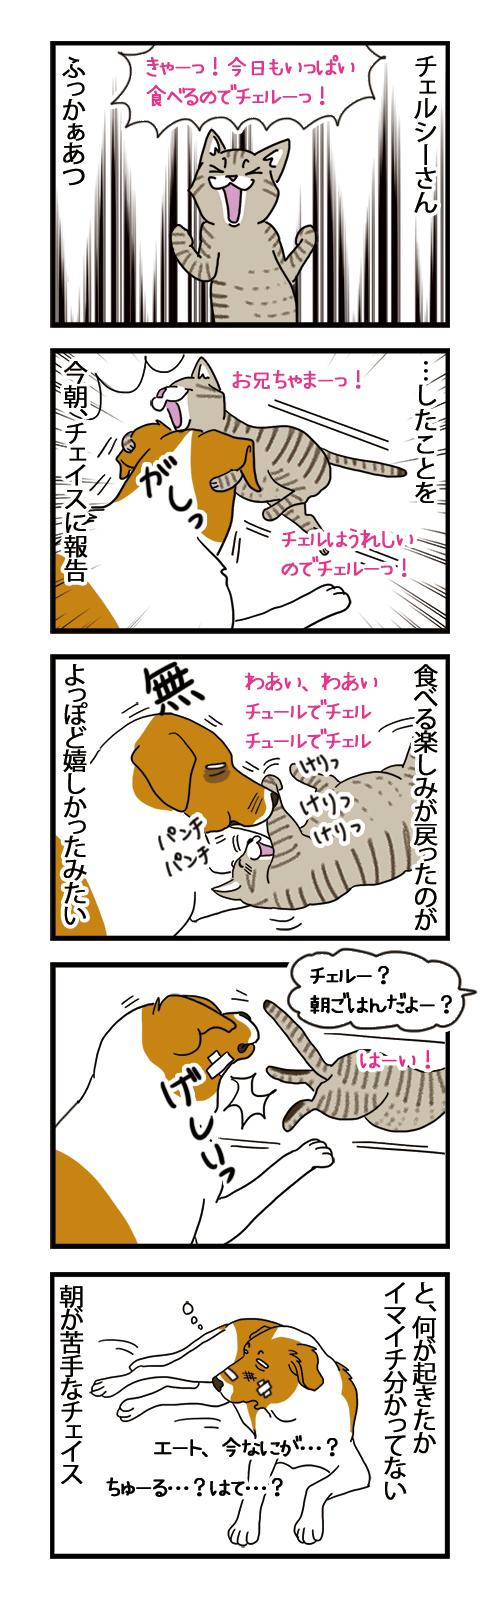 29072021_dogcomic.jpg